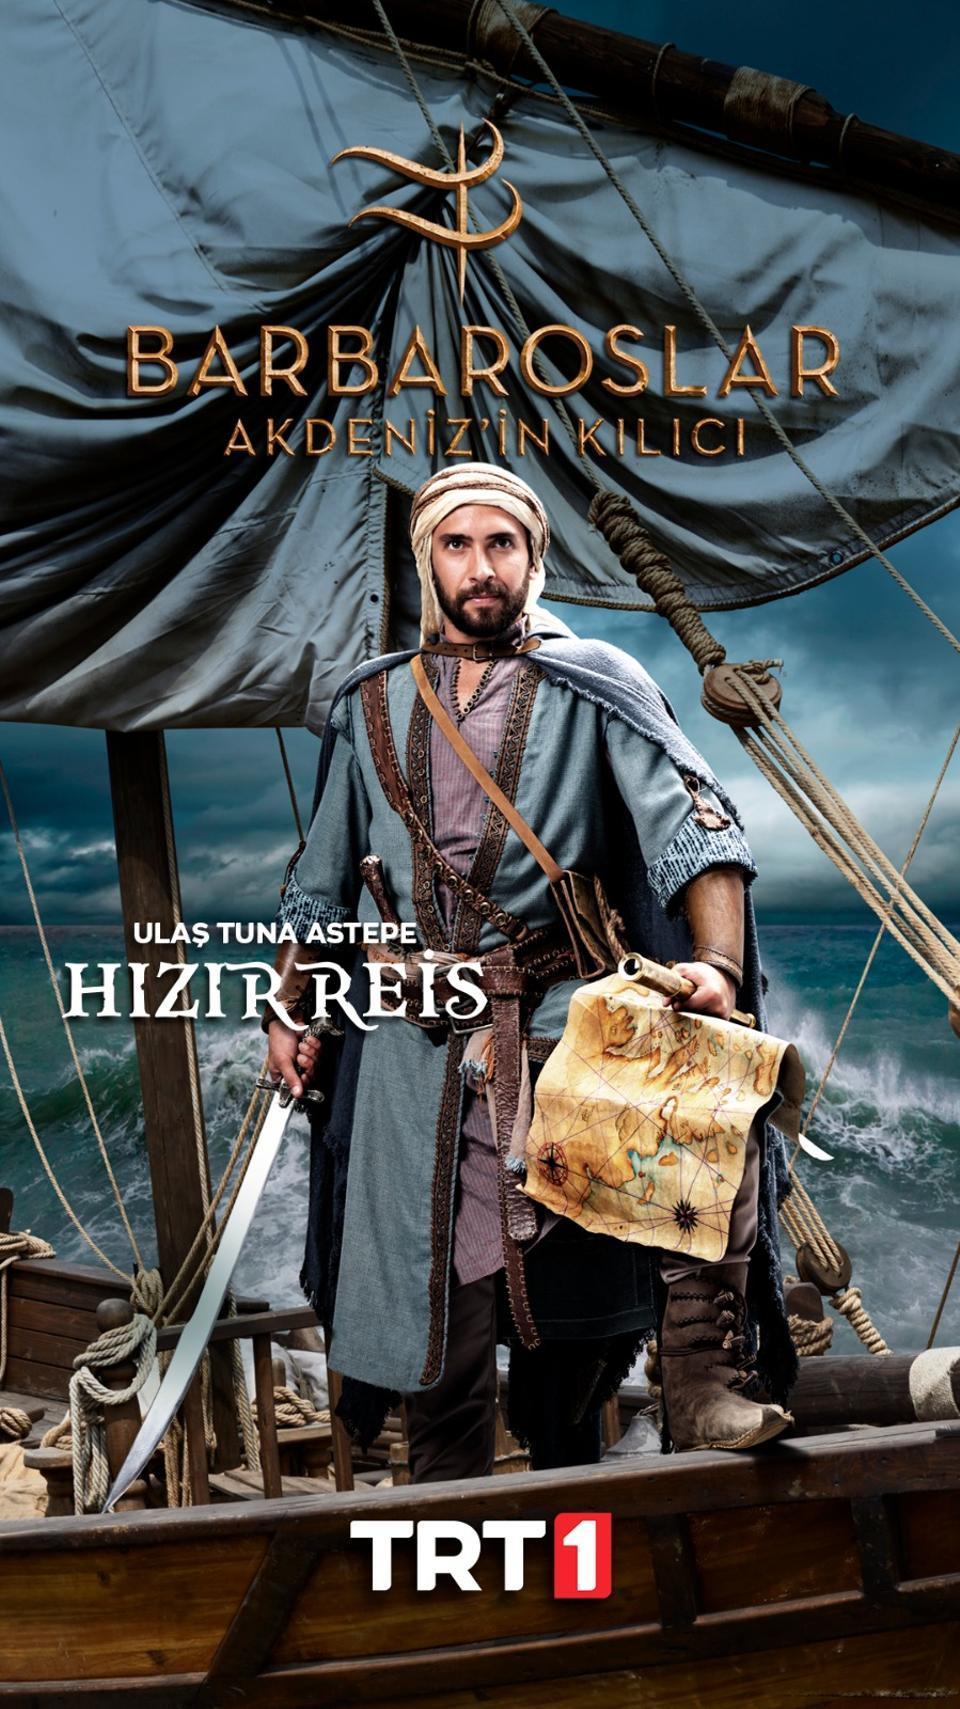 Hizir Reis will eventually become Barbaros Hayreddin Pasha, the admiral of the Ottoman fleet.